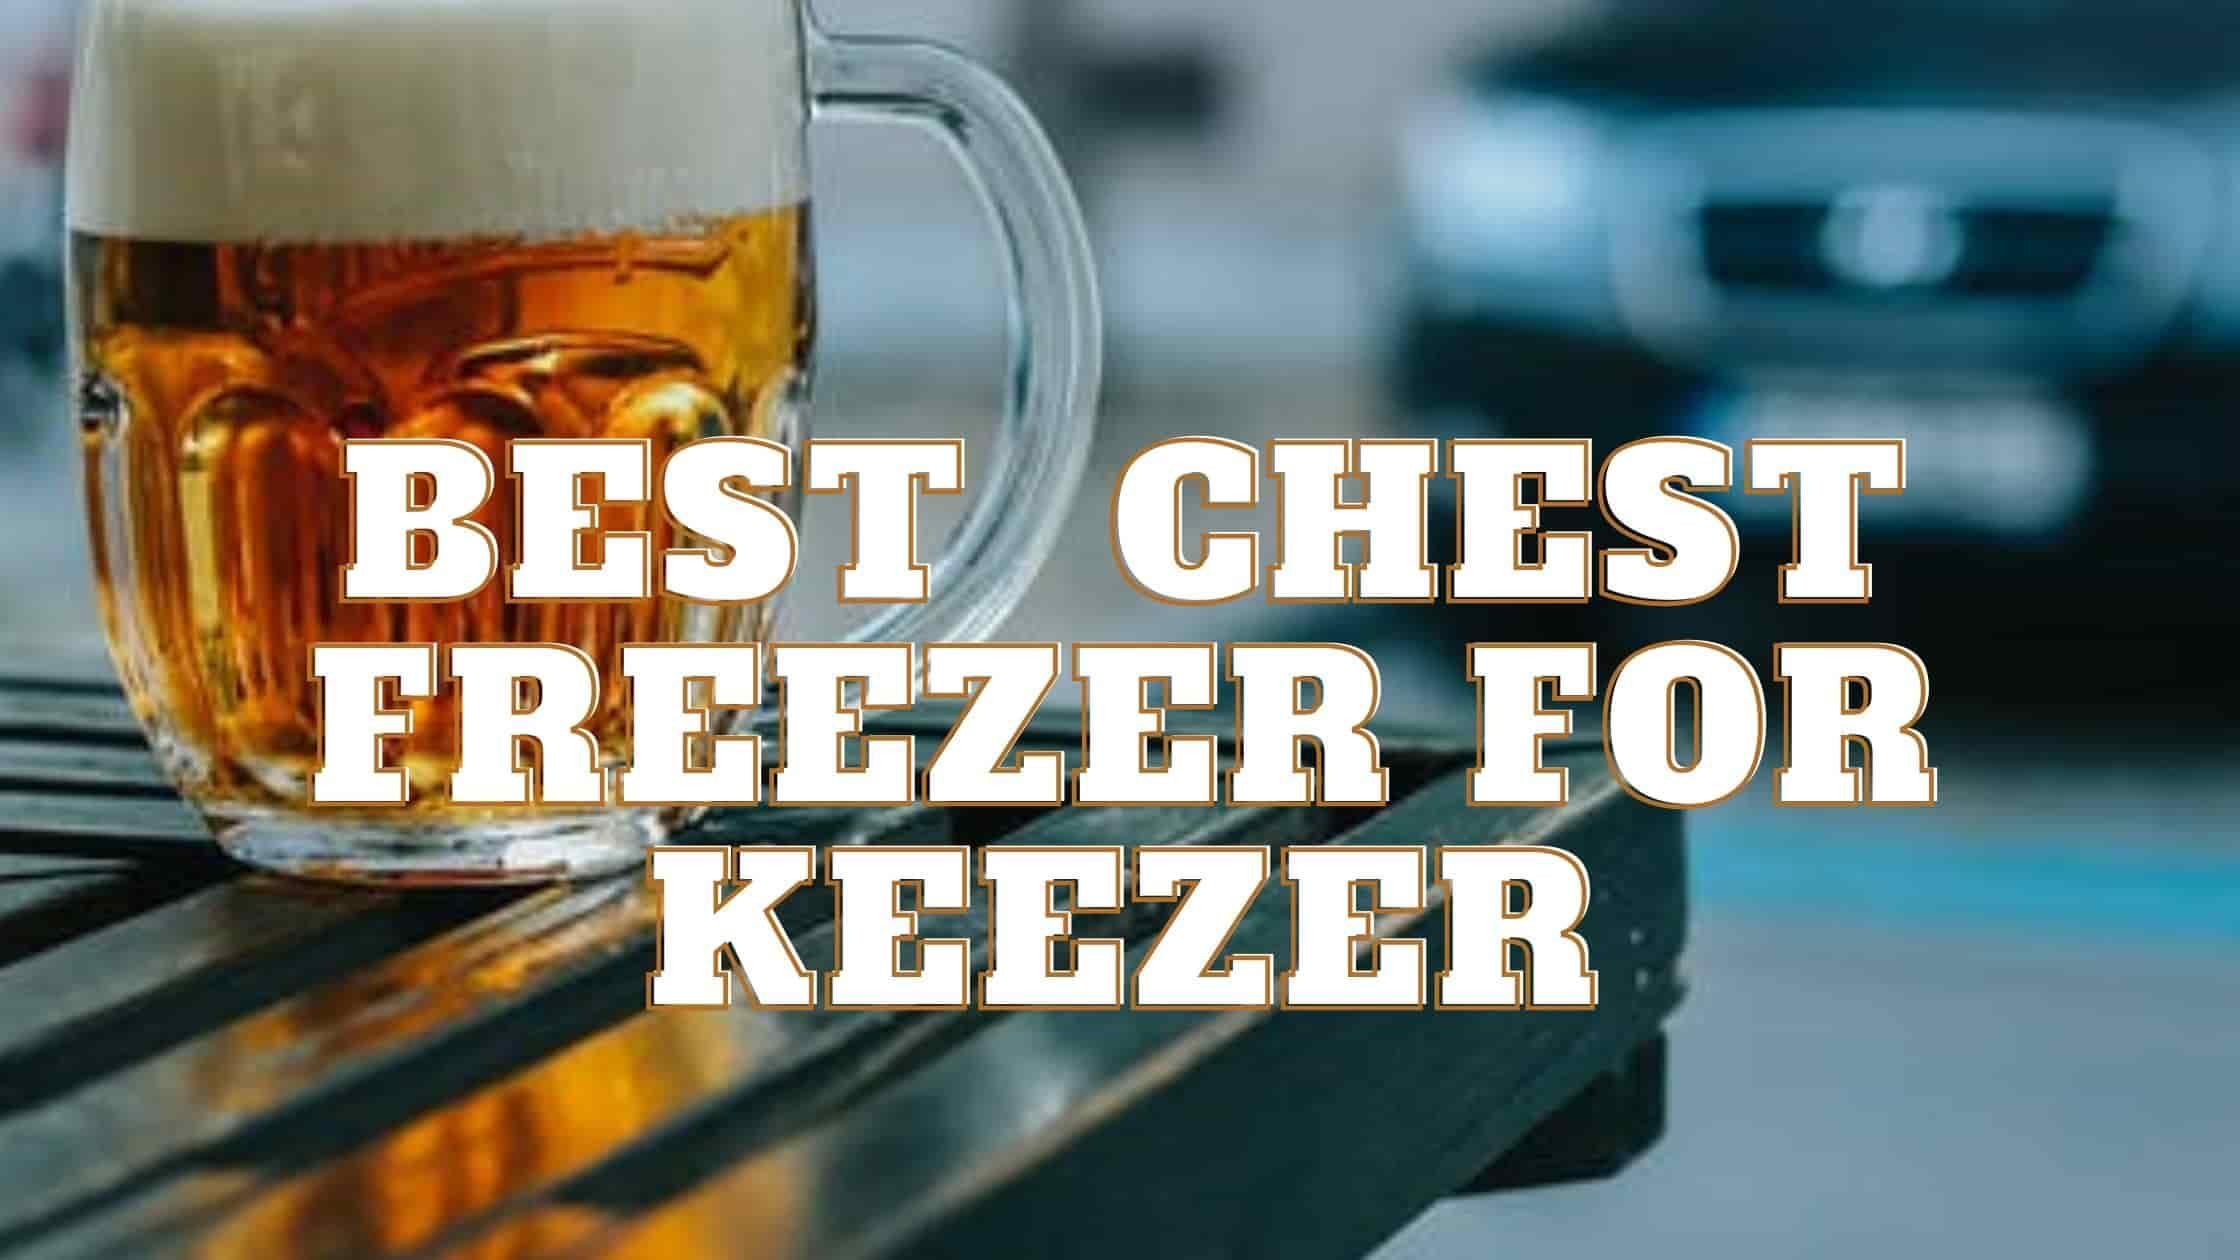 best chest freezer for keezer